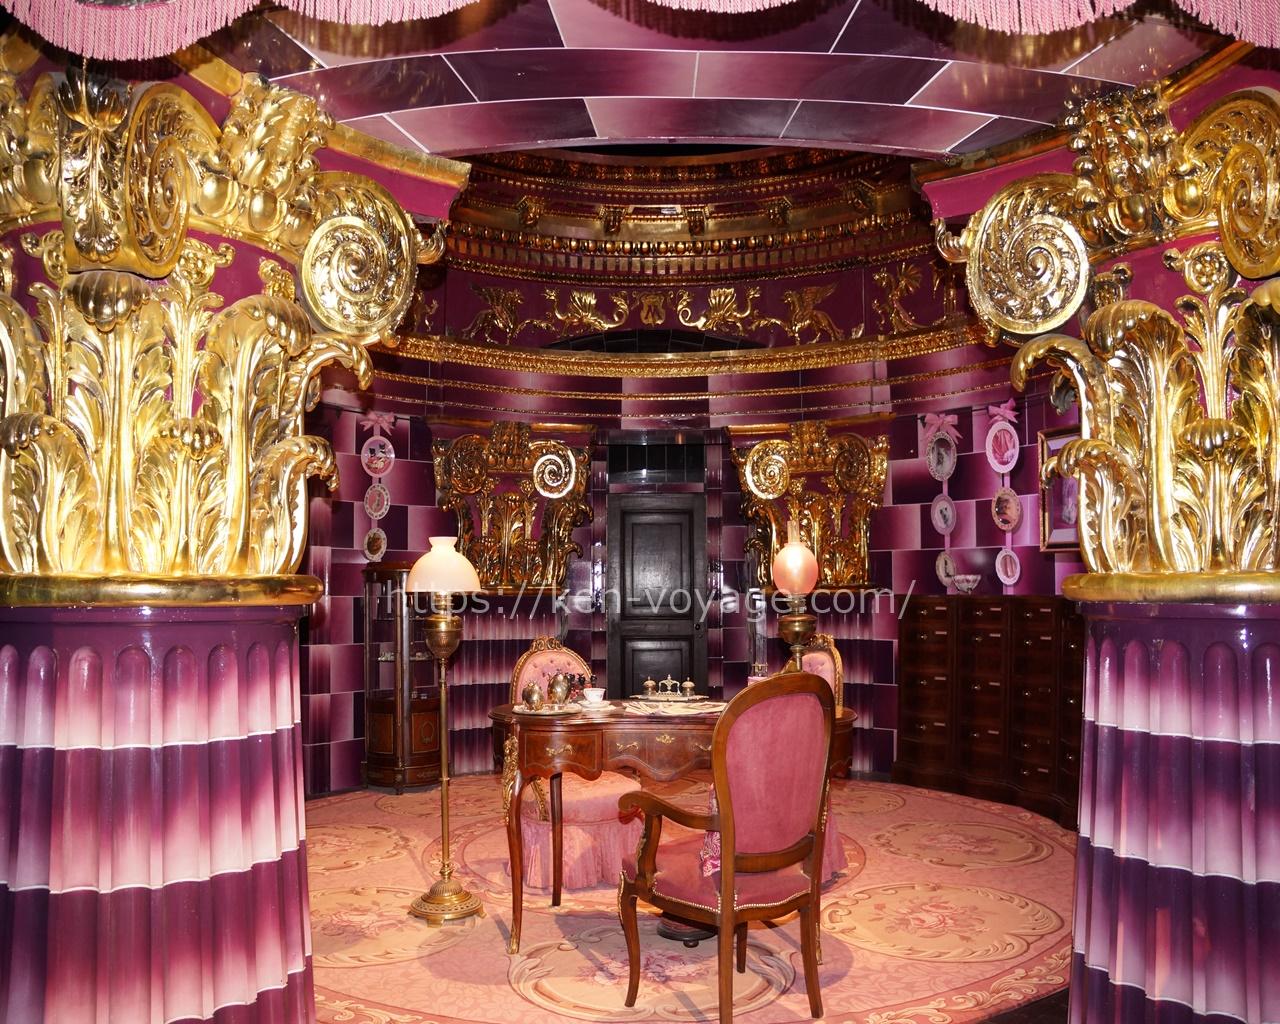 Umbridge's room